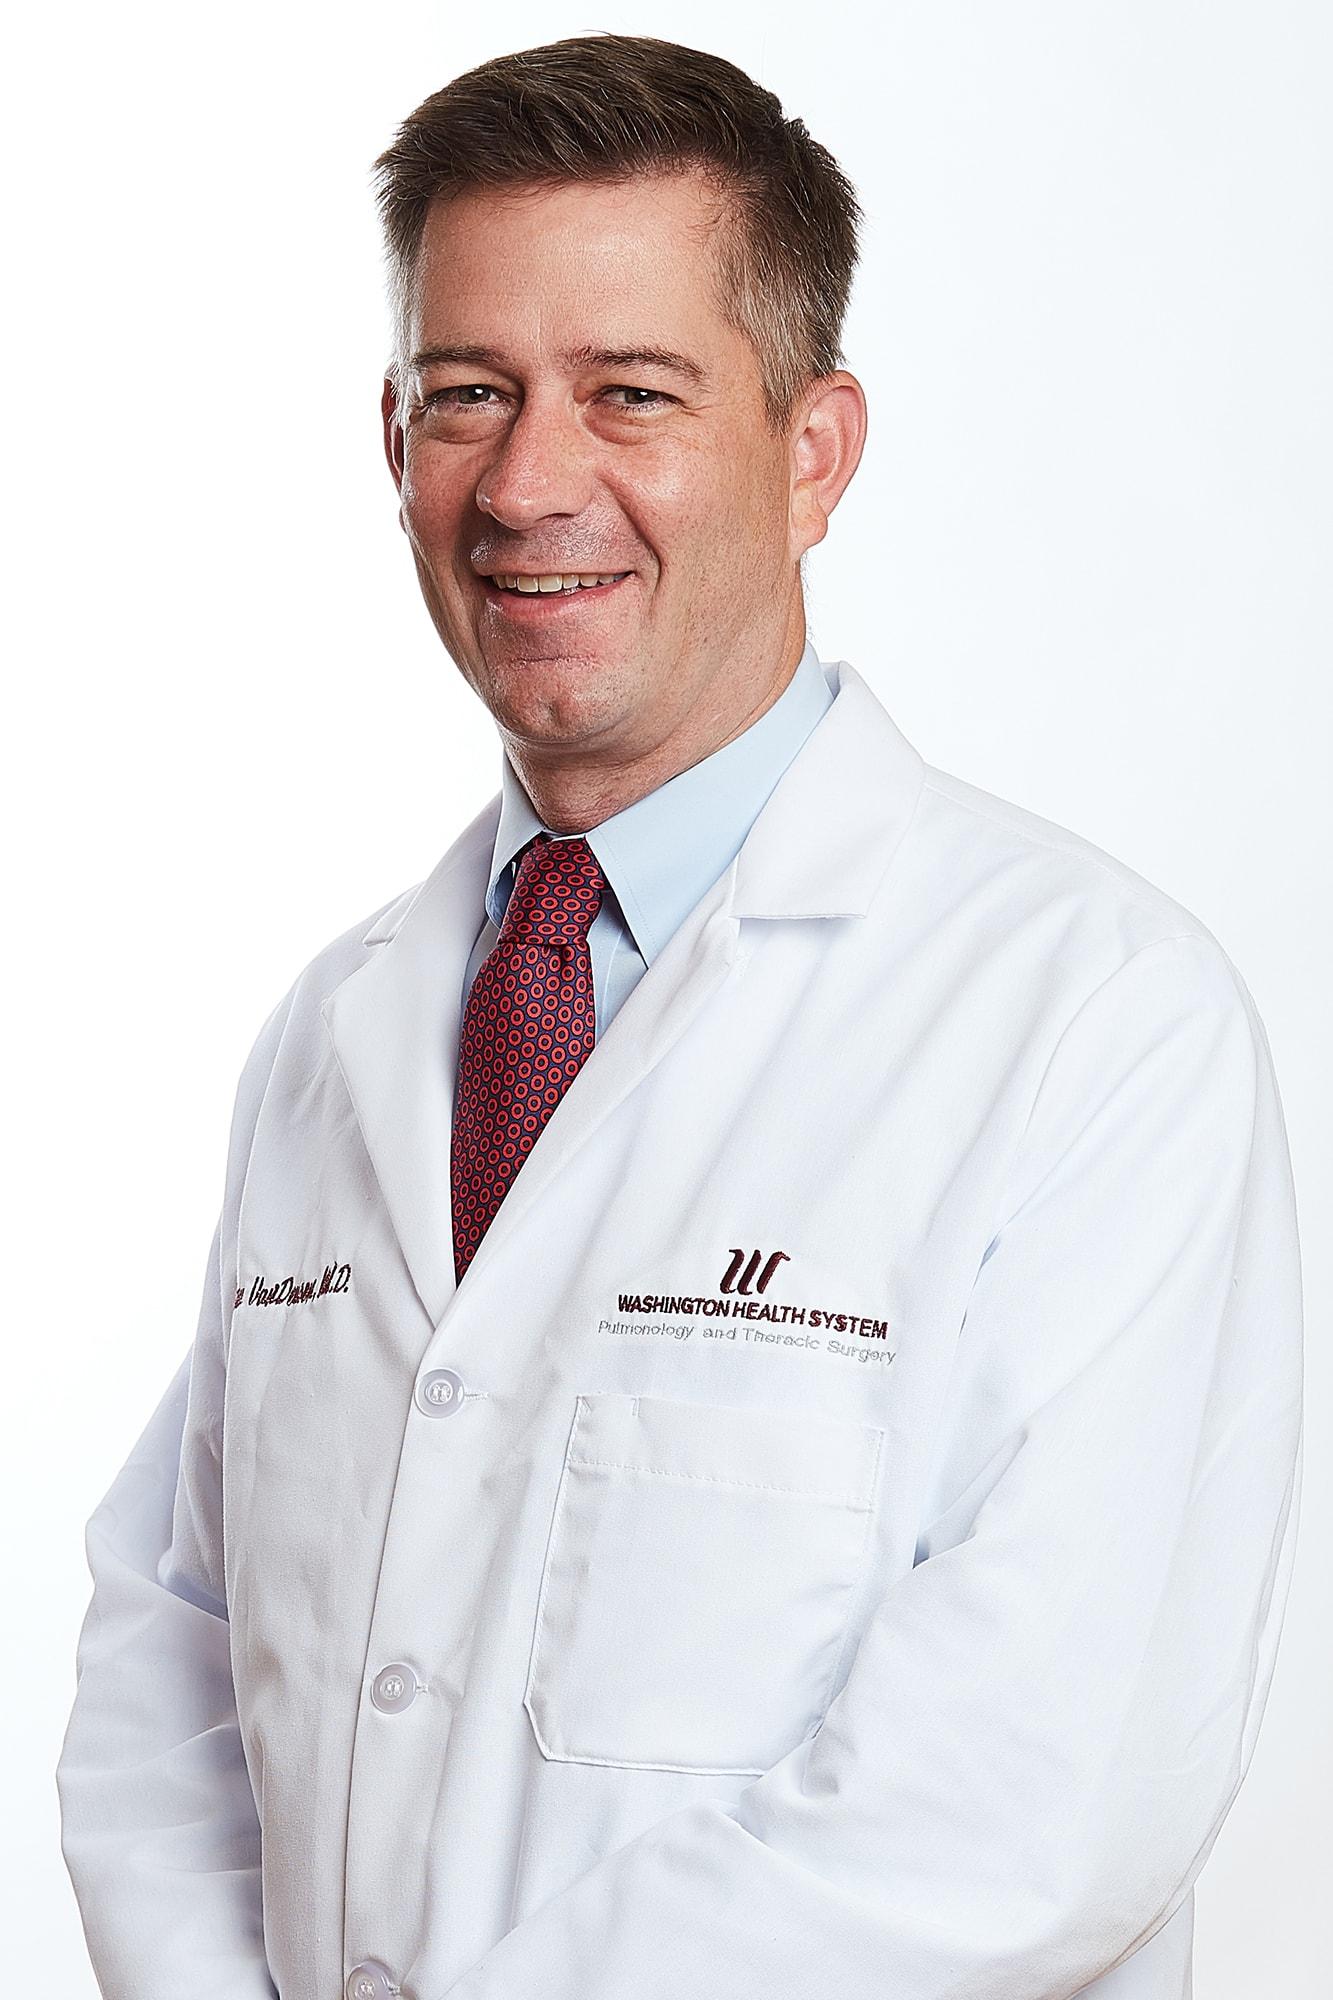 Photo of Mathew A. Van Deusen, M.D.